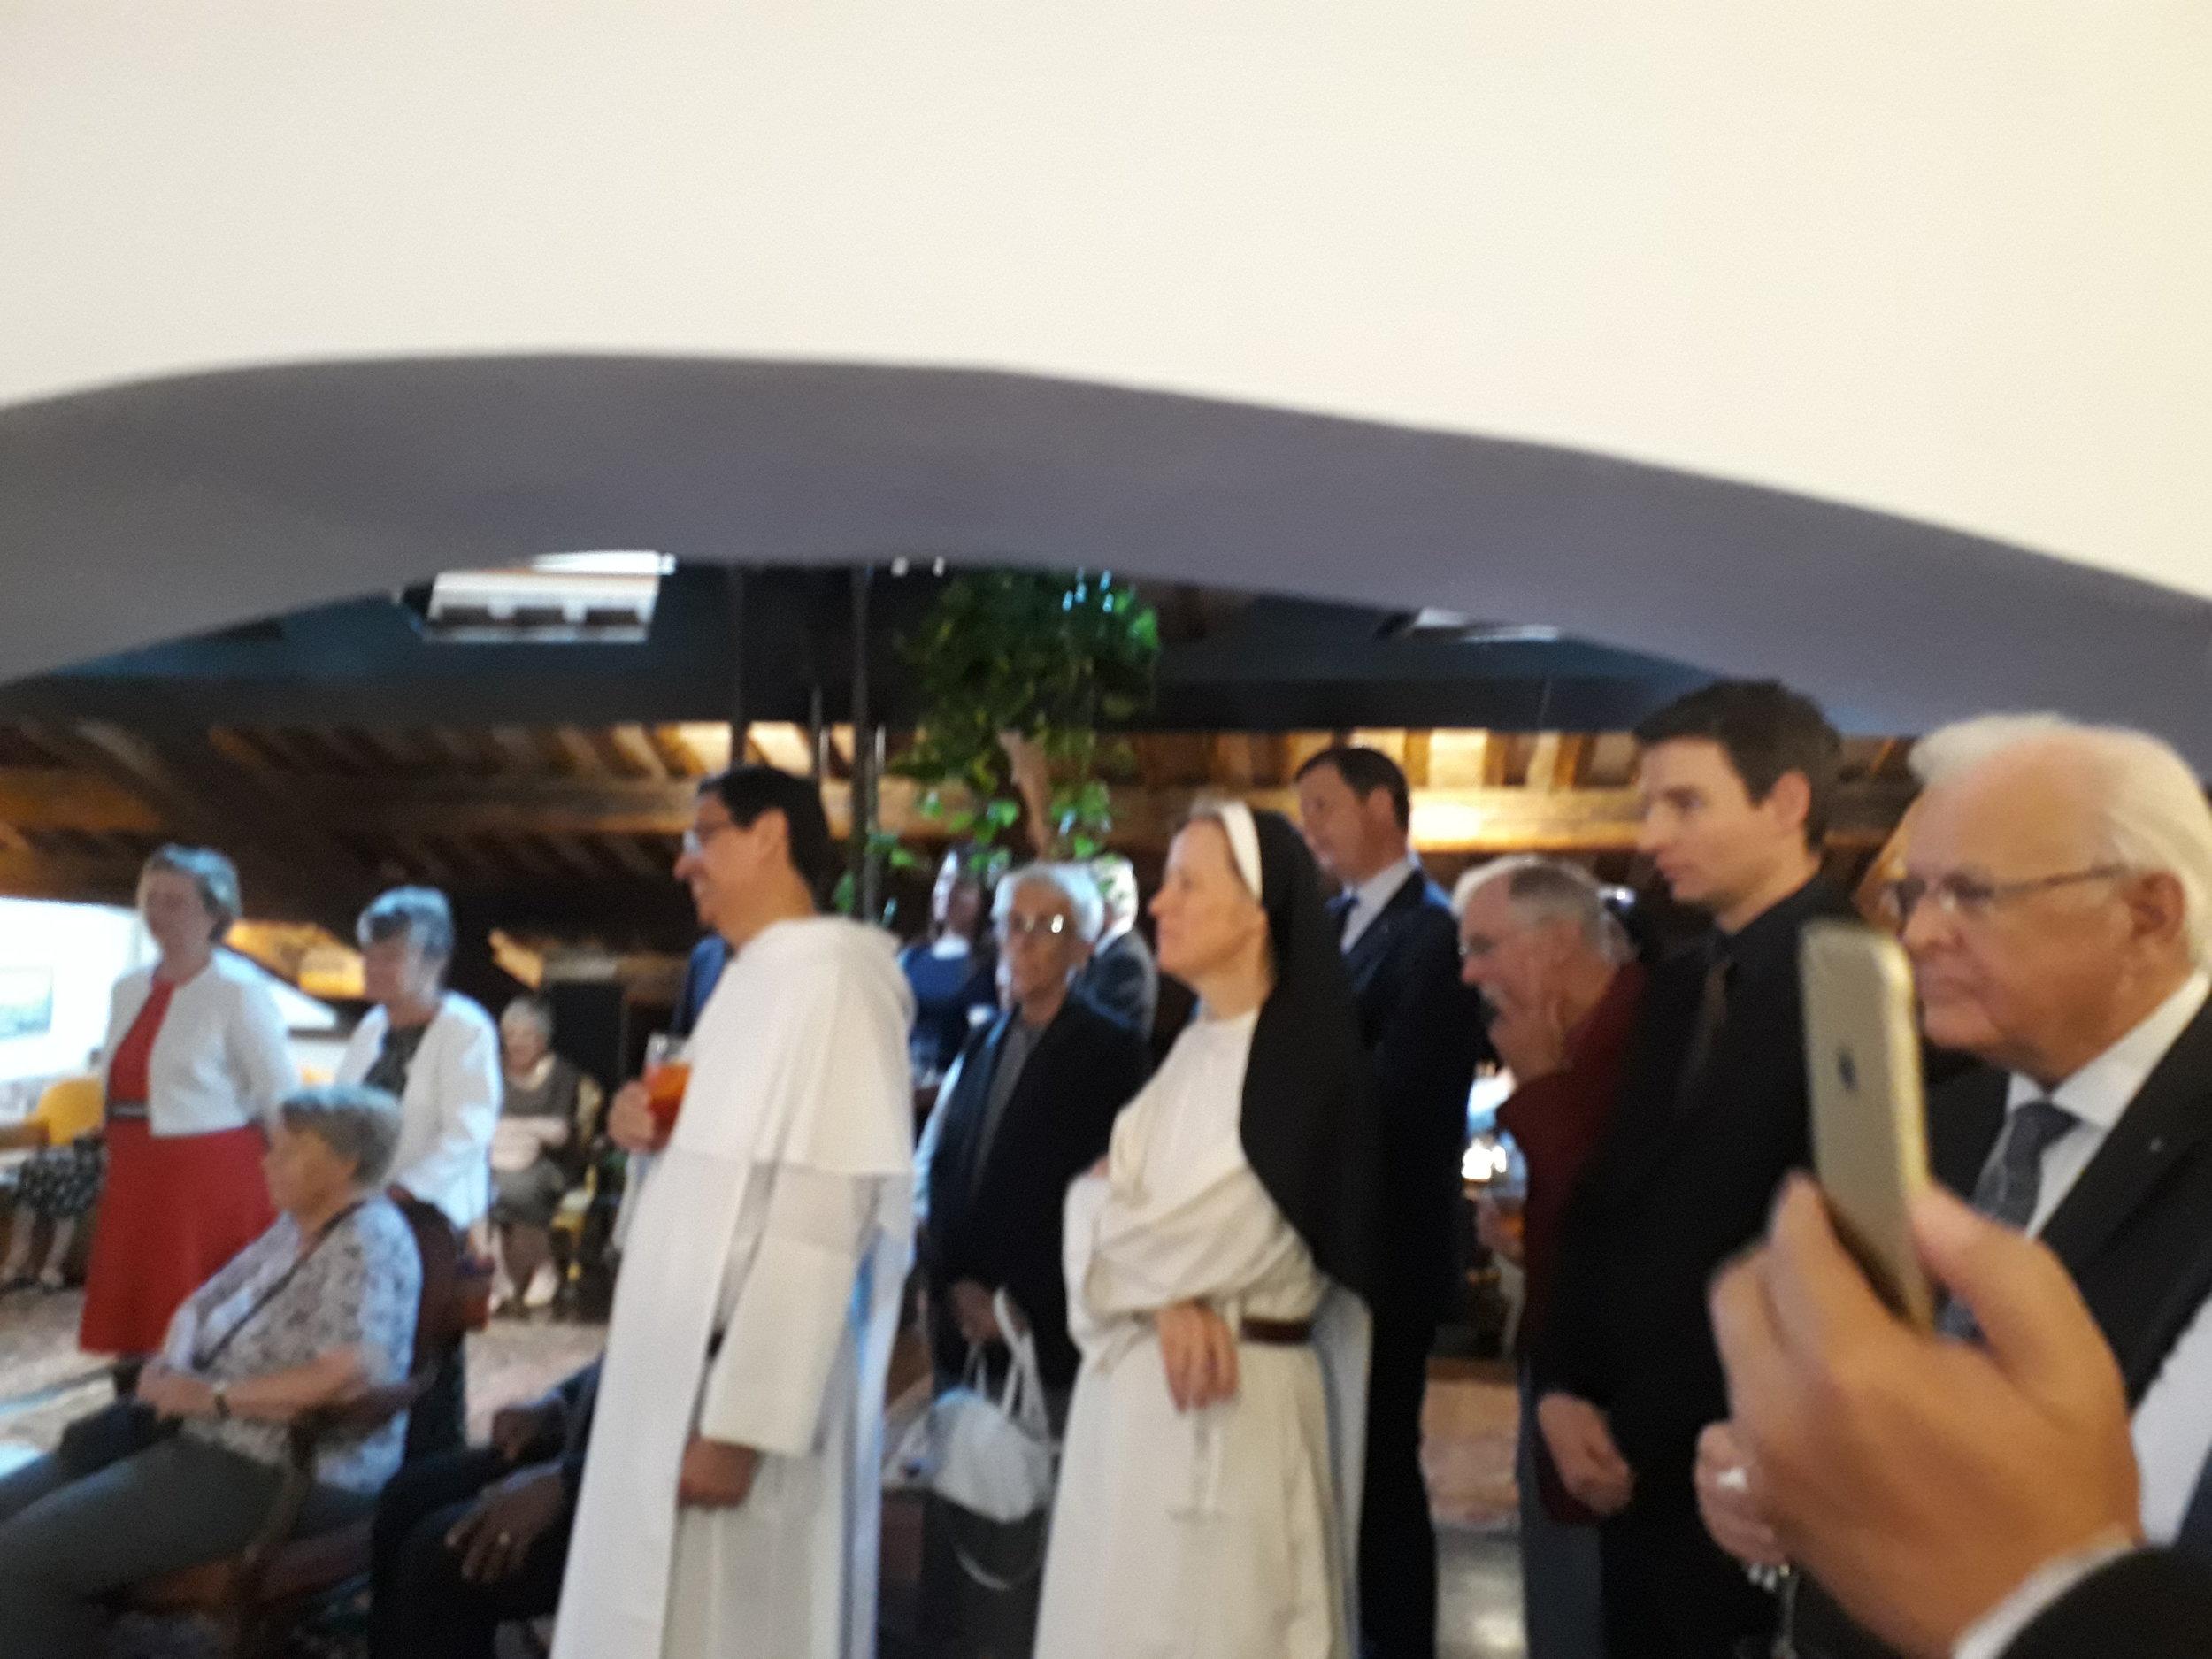 Rome reception for Sr Imelda